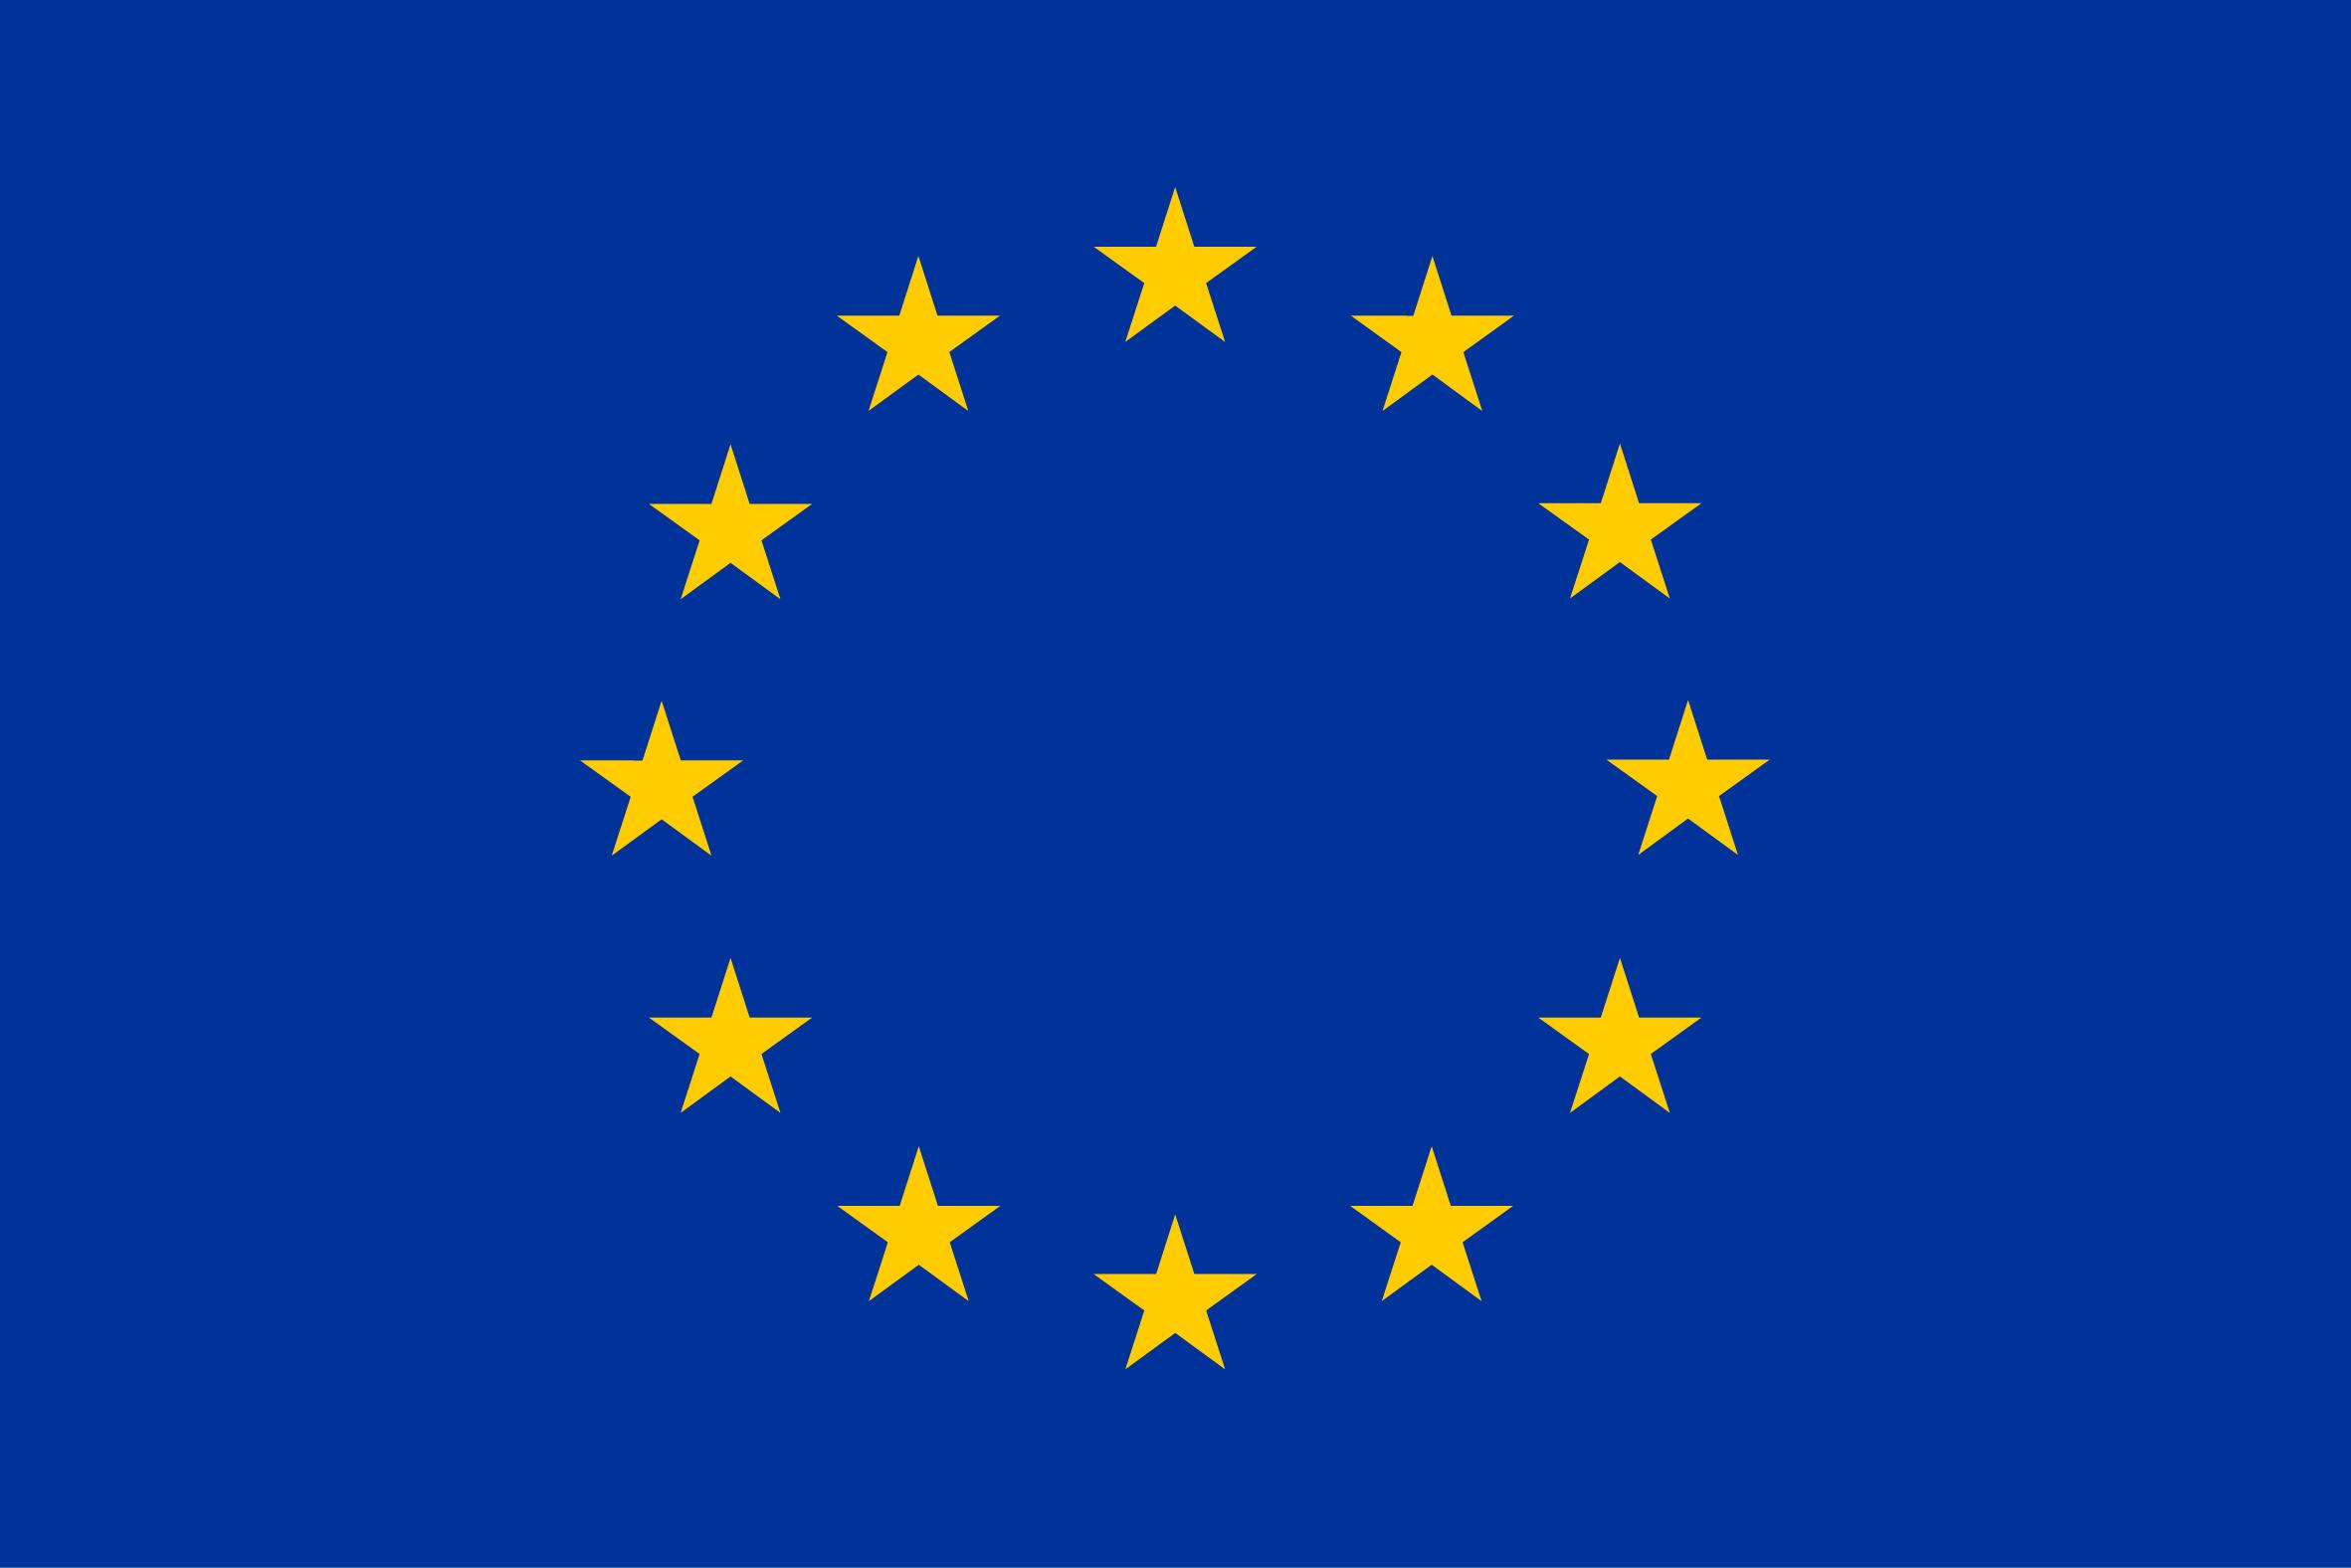 https://europa.eu/european-union/sites/europaeu/files/docs/body/flag_yellow_high.jpg